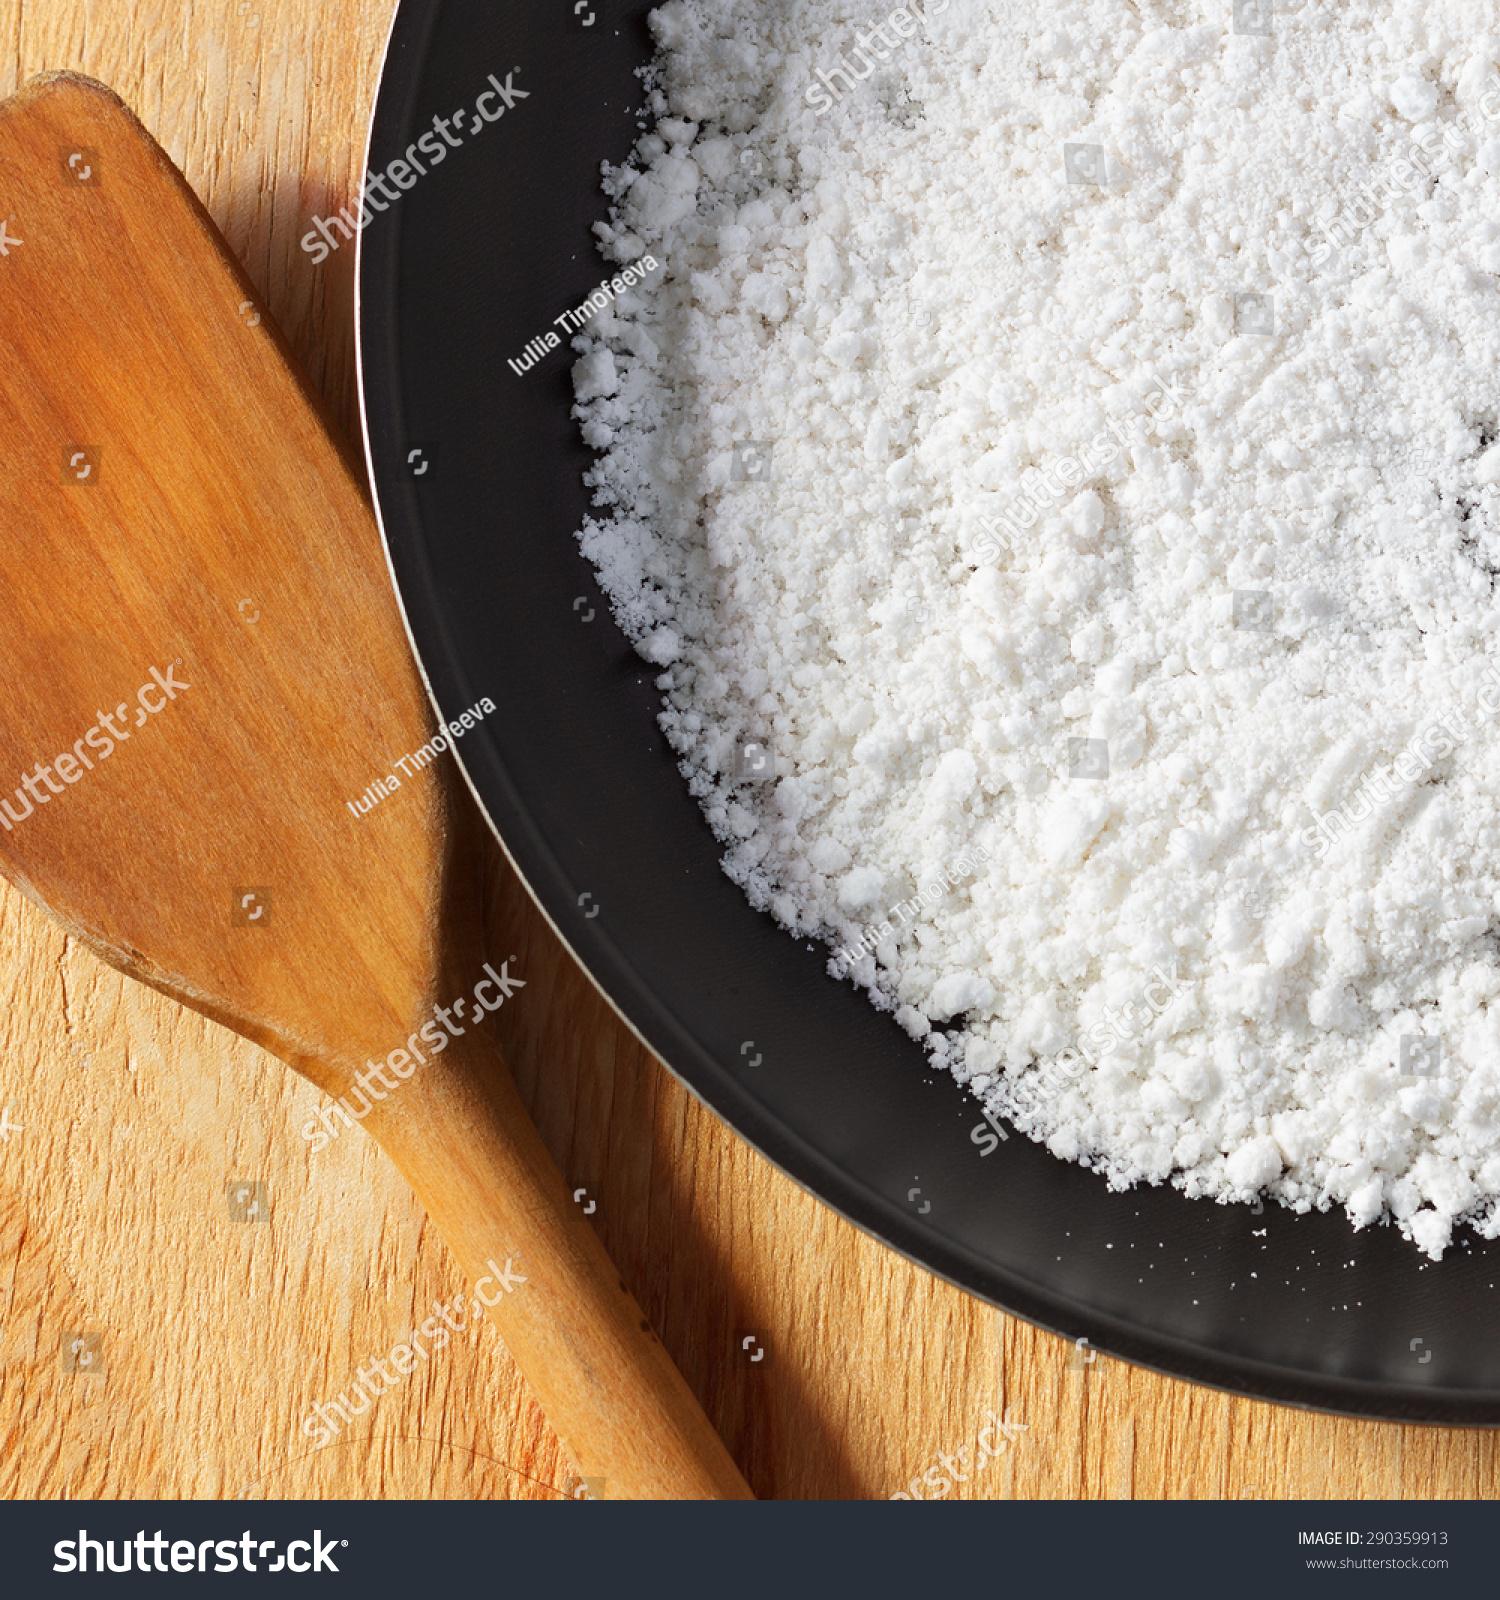 how to make tapioca from cassava